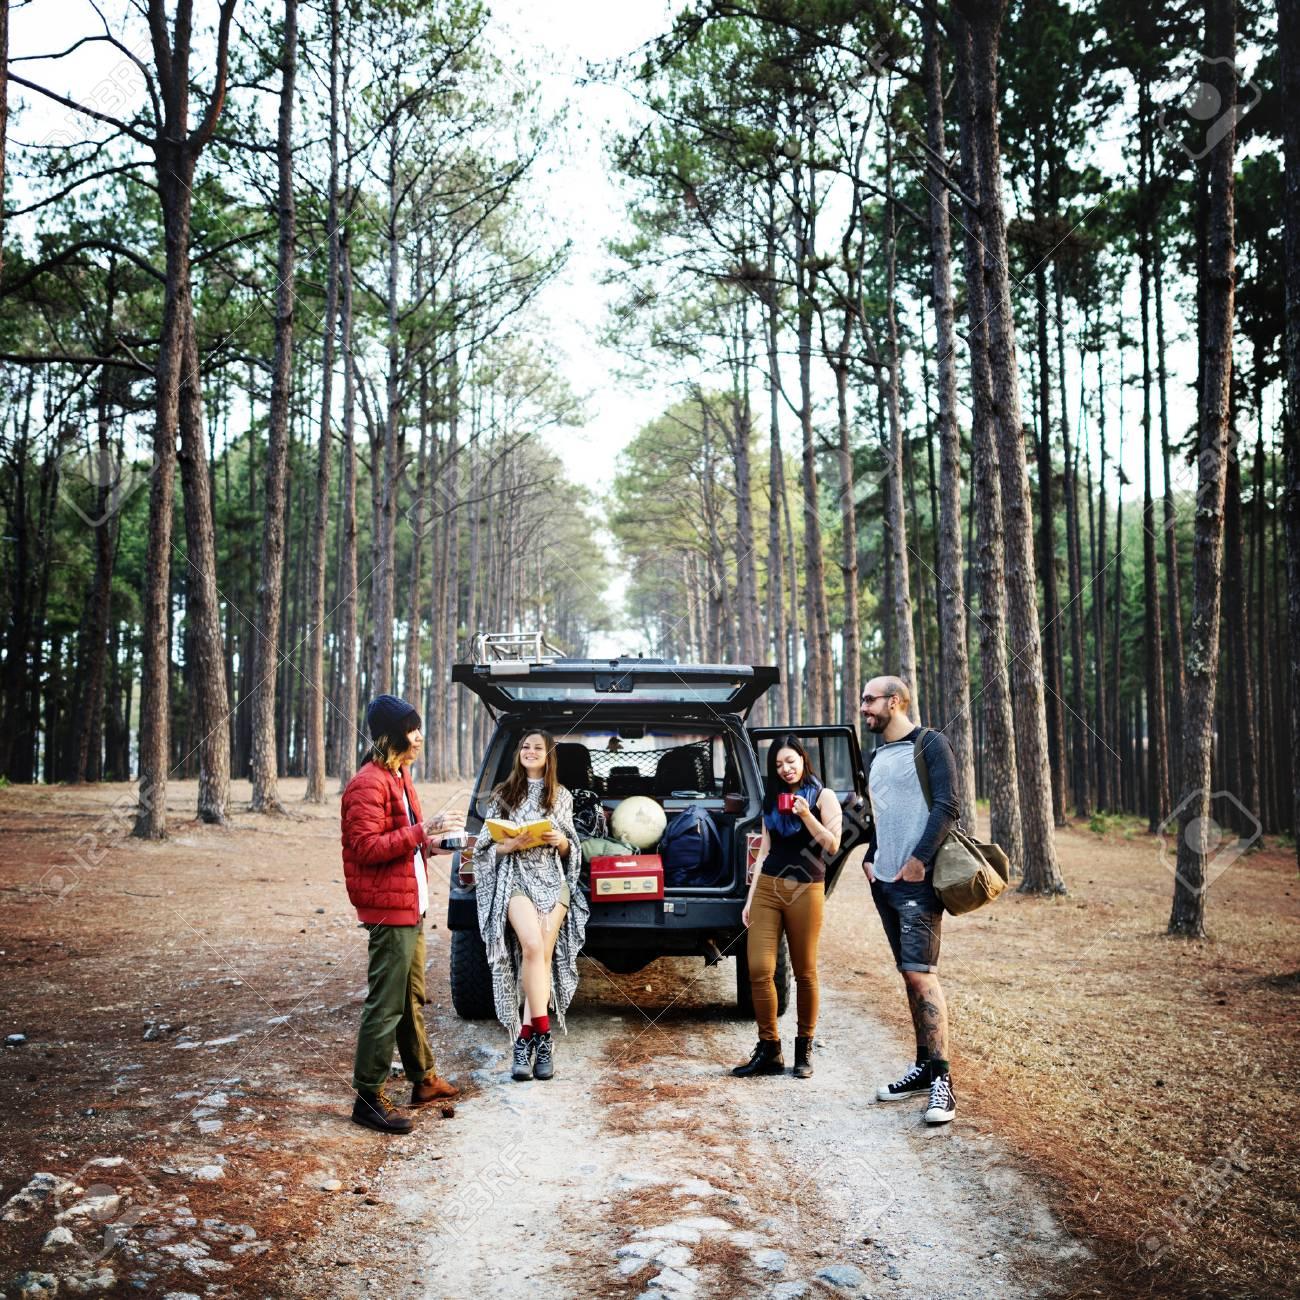 People Friendship Hangout Traveling Destination Camping Concept - 61348686